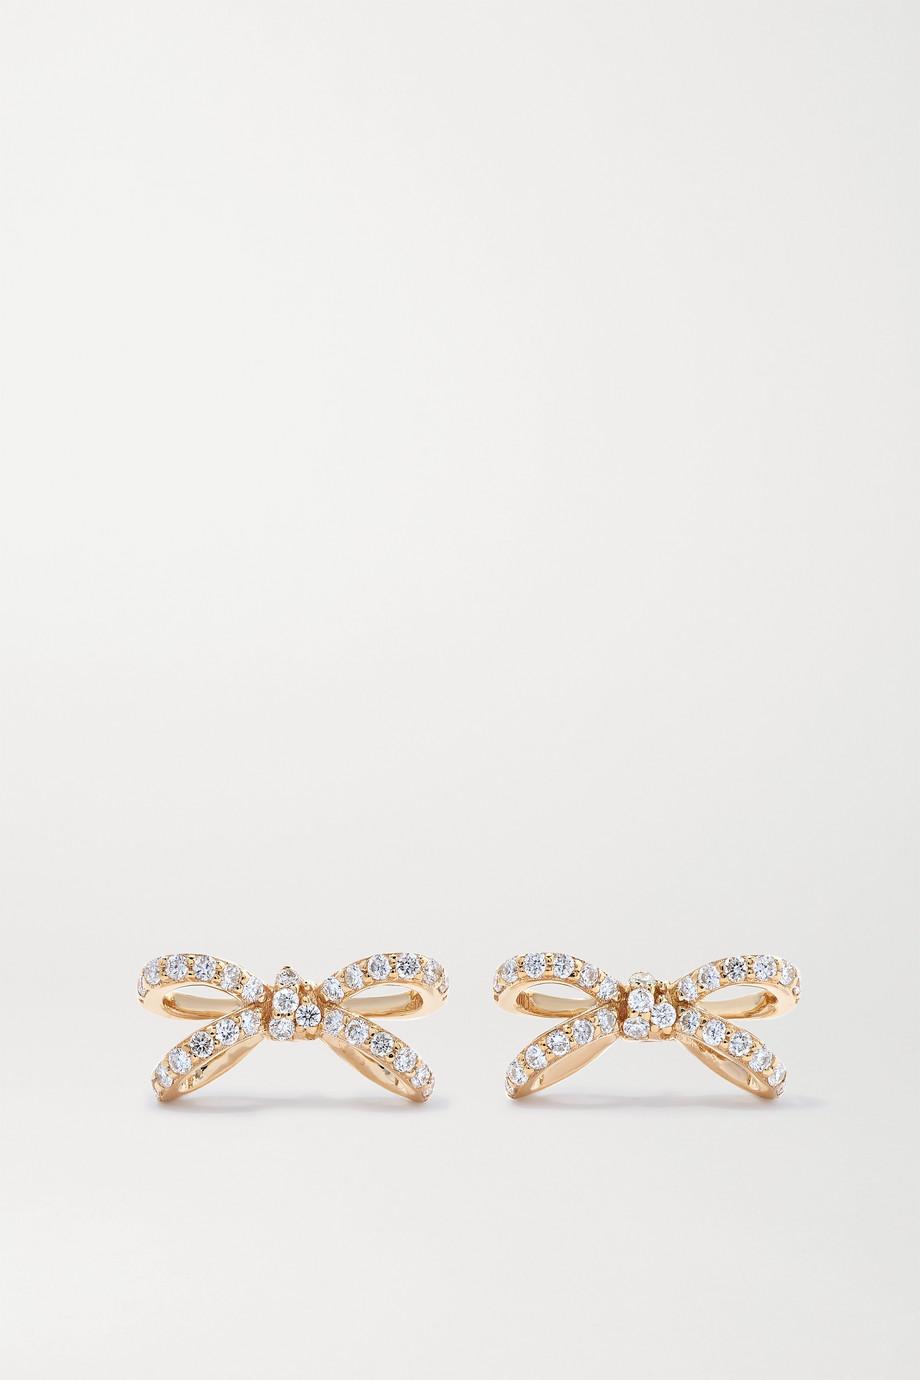 Sydney Evan Small Bow 14-karat gold diamond earrings